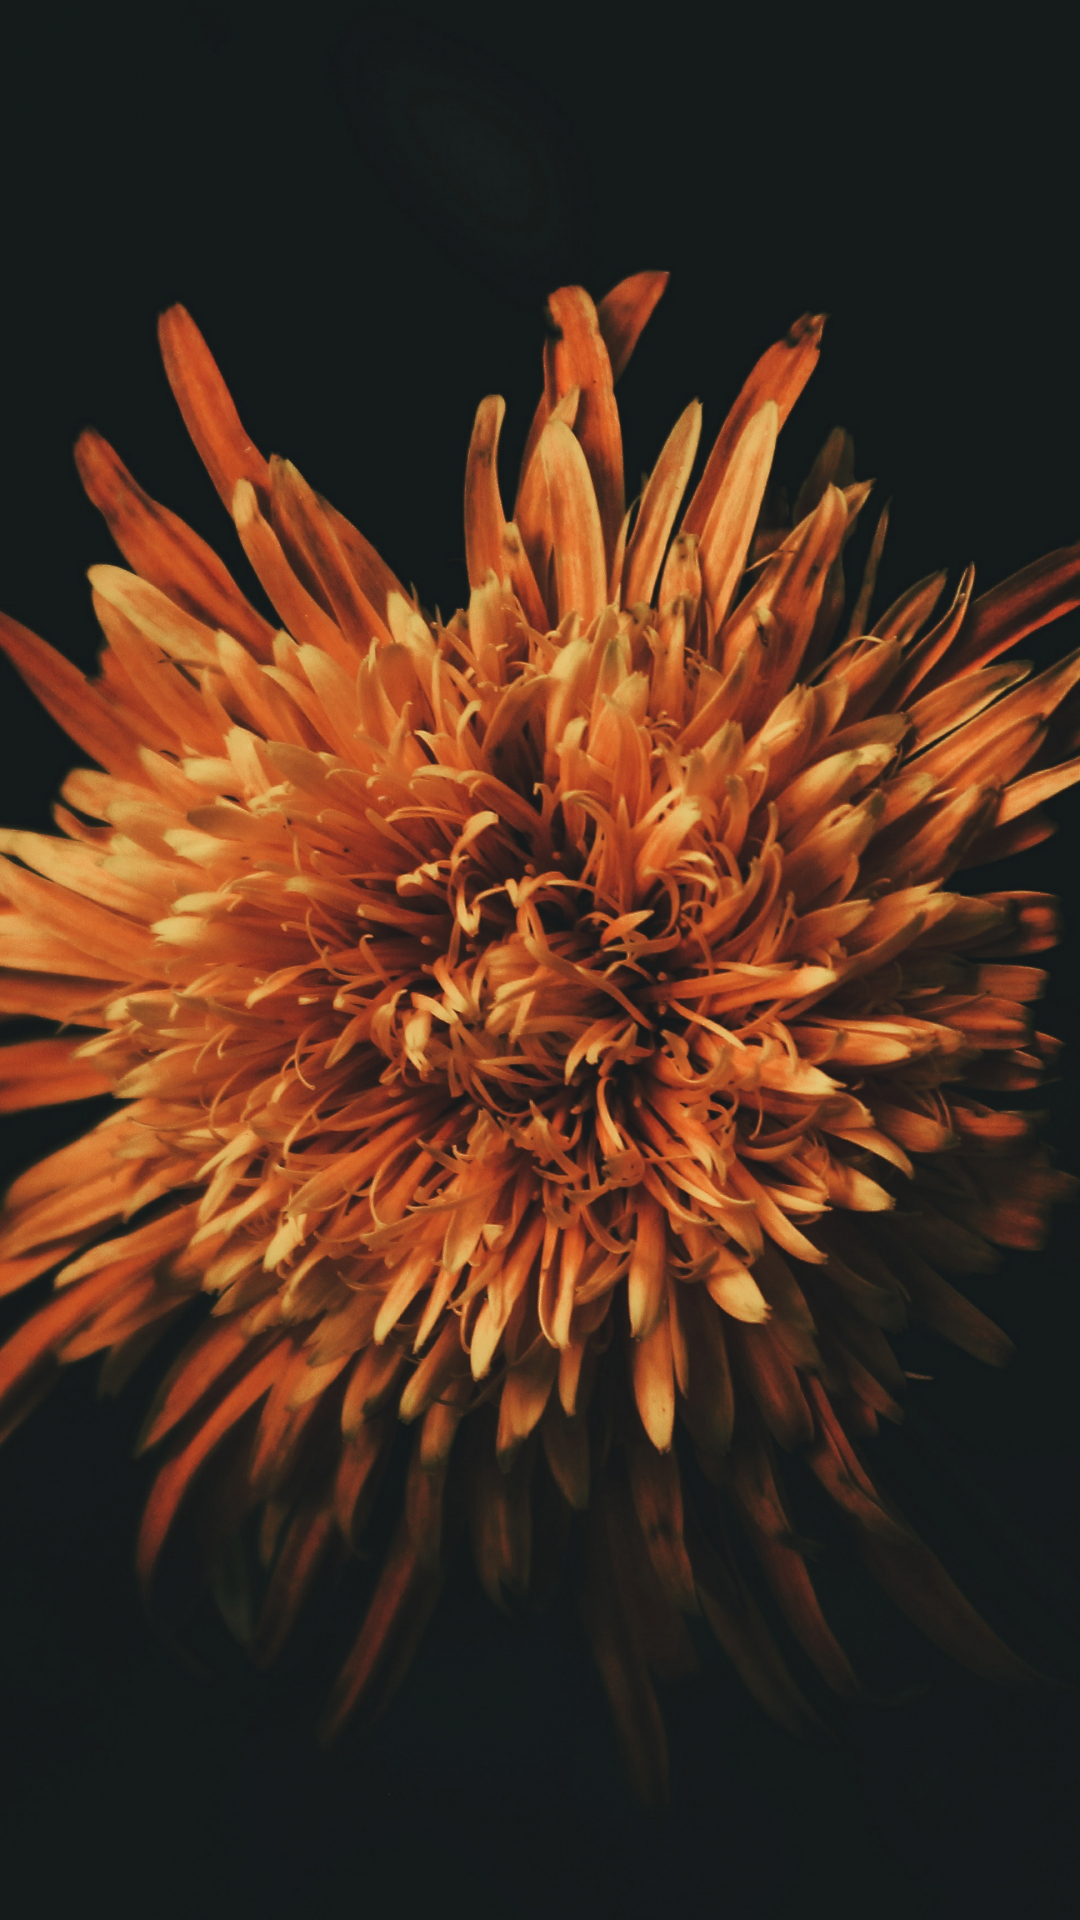 Orange Flower iPhone Wallpaper